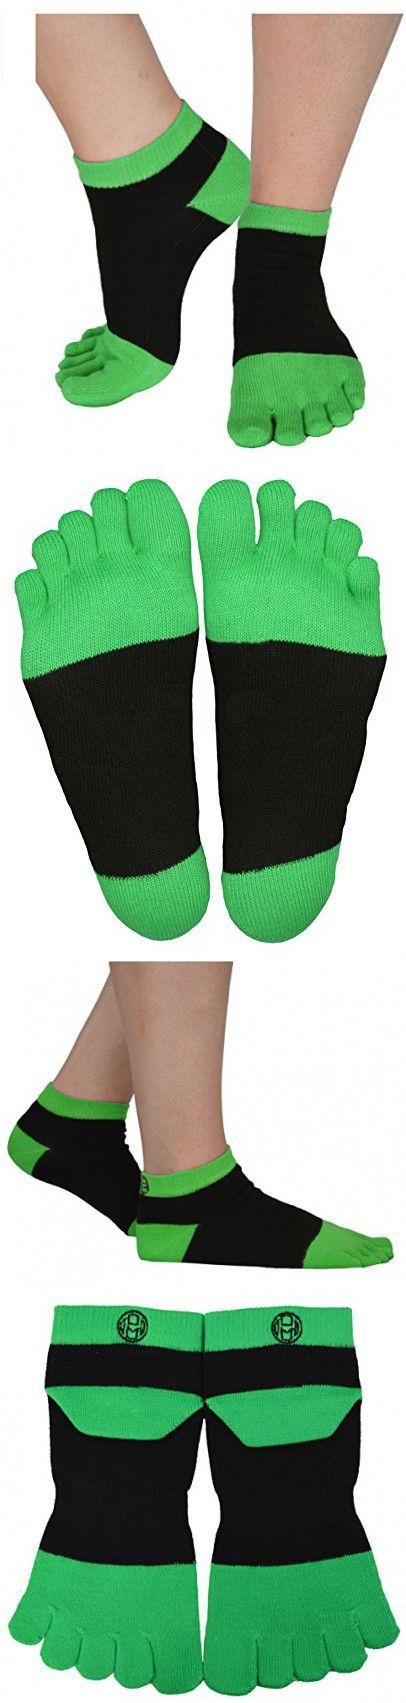 Mato & Hash 5 Toe Active Athletic Performance Sport Toe Socks 6PK Black/Bright Green S/M